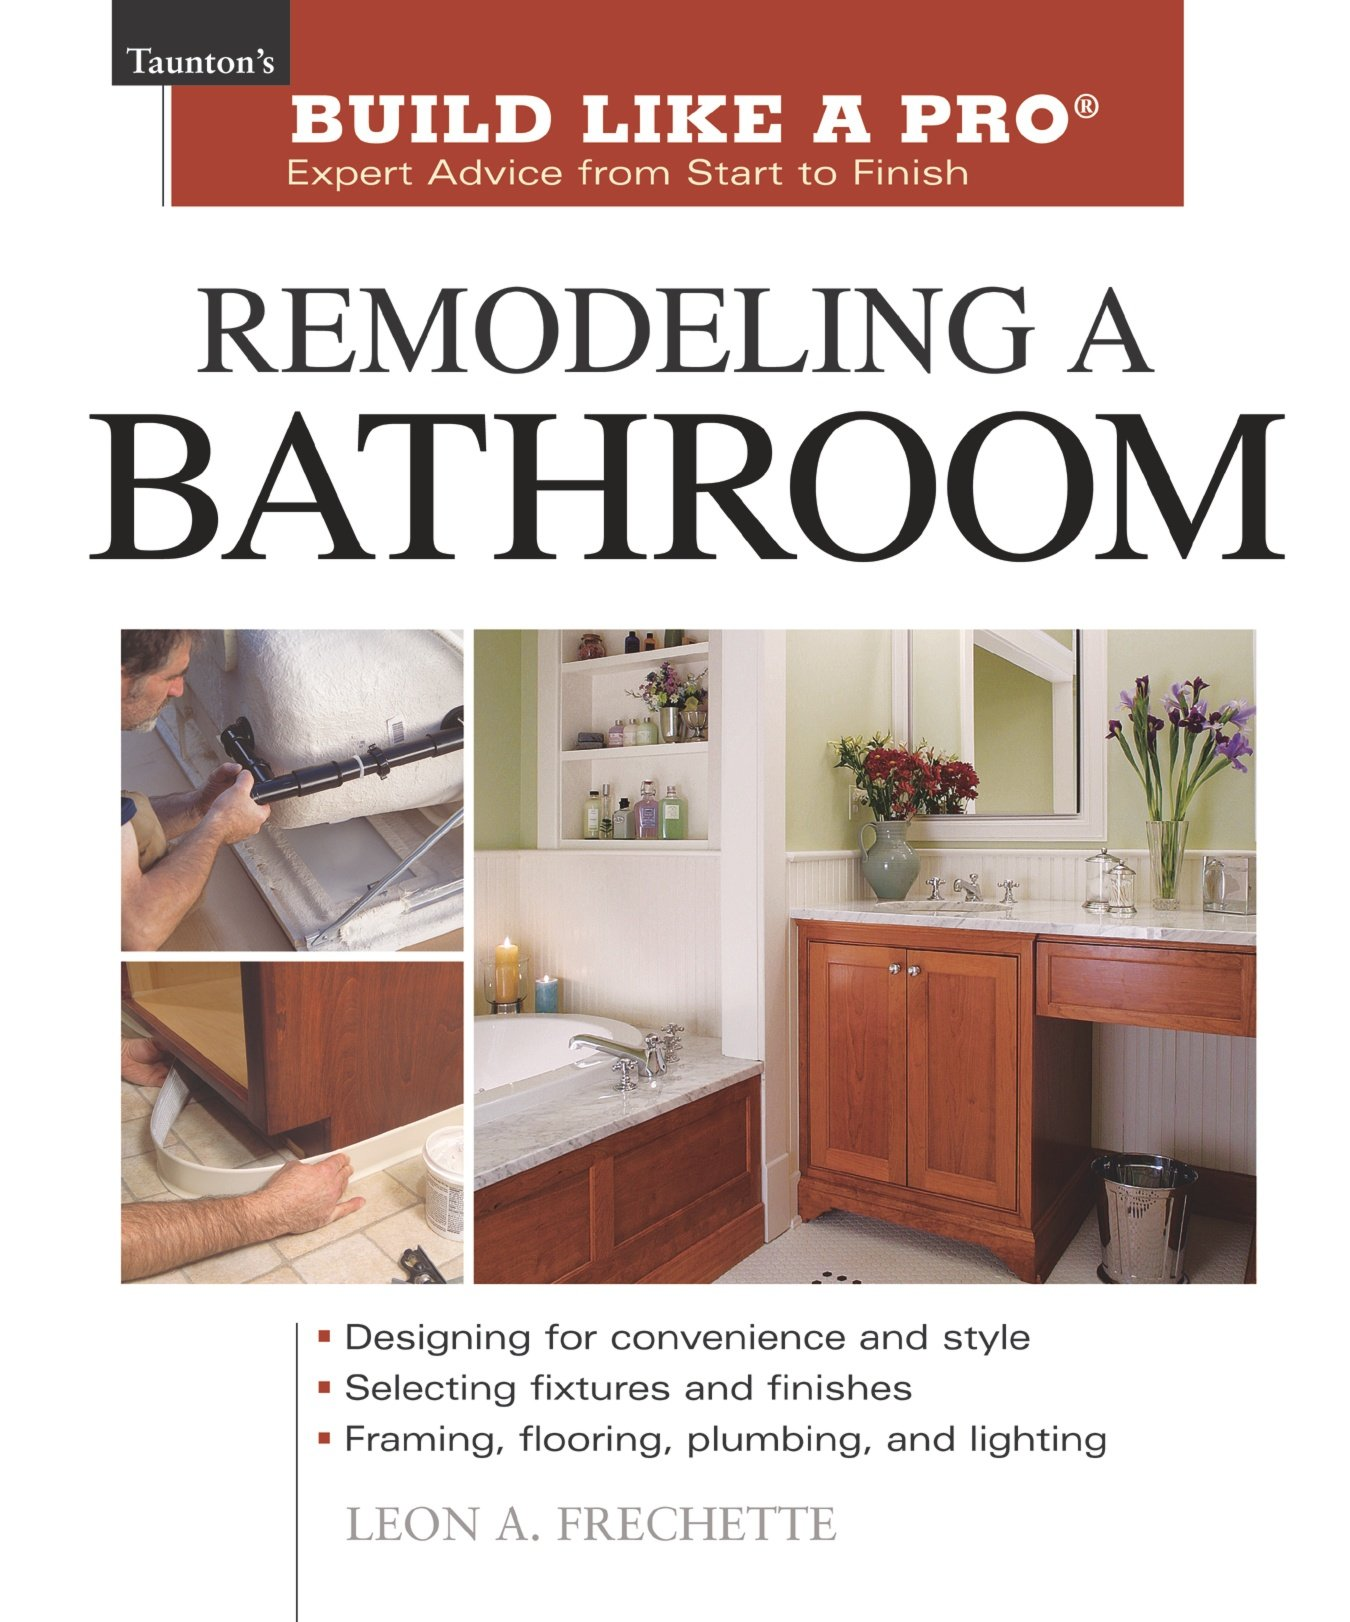 Remodeling A Bathroom (Tauntonu0027s Build Like A Pro): Leon A. Frechette:  9781561586219: Amazon.com: Books